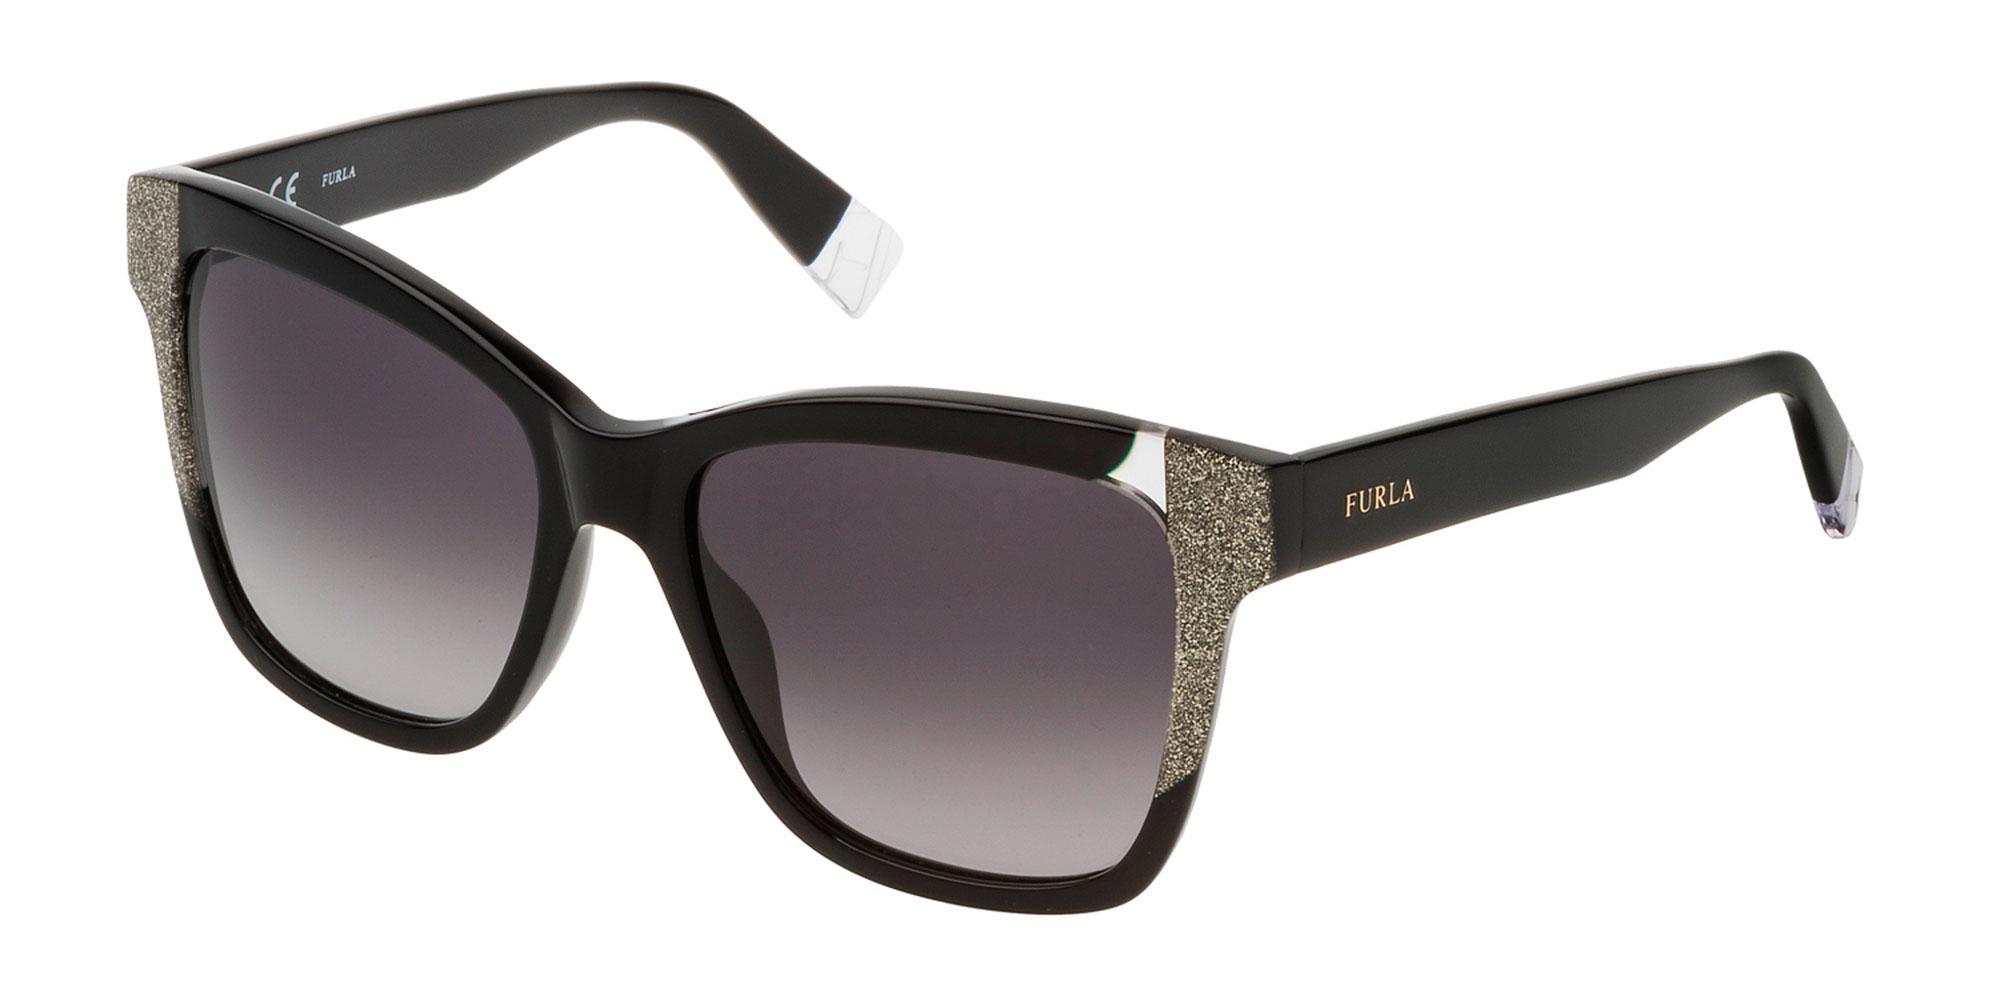 0700 SFU240 Sunglasses, Furla